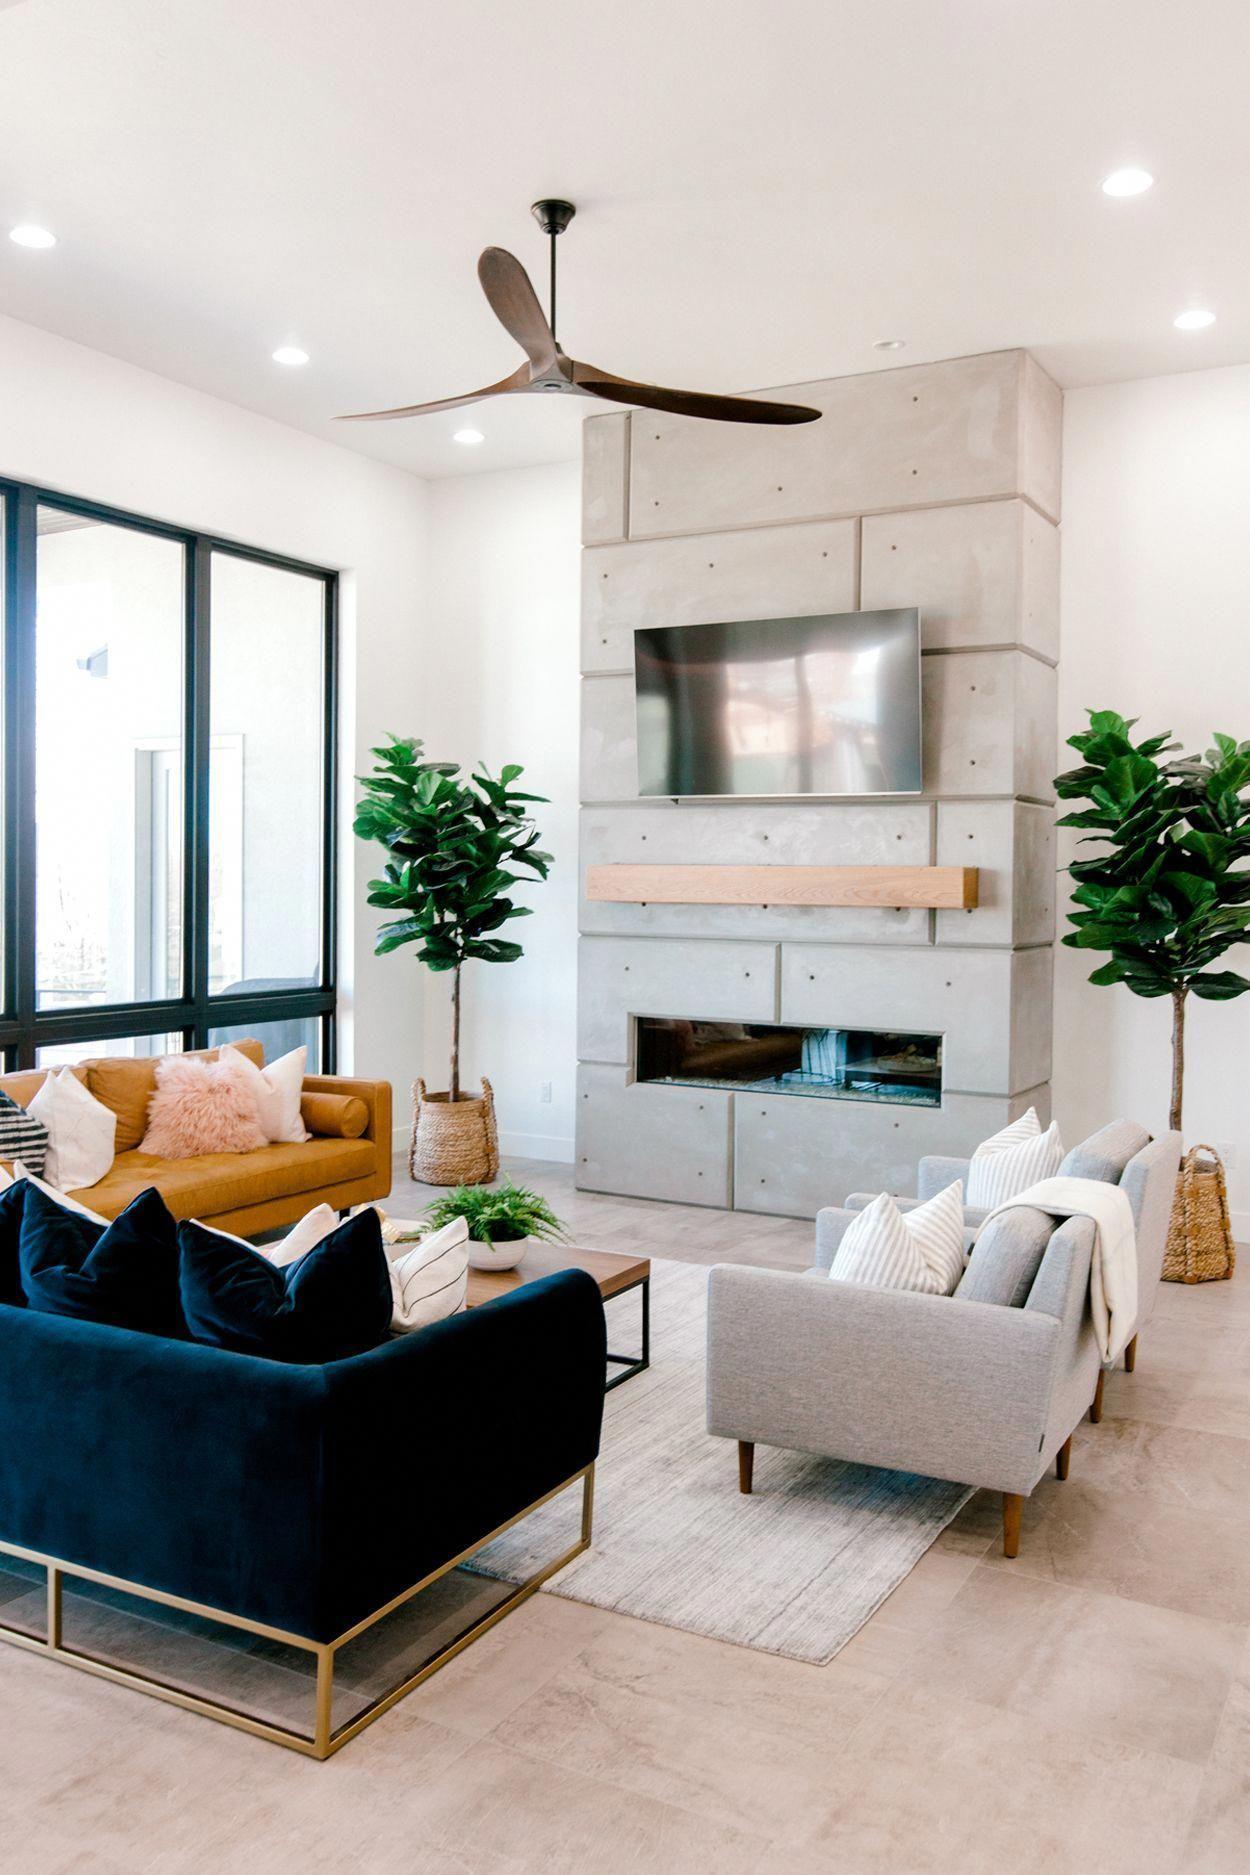 Kits Cascadia Blue Sofa #livingroomideas